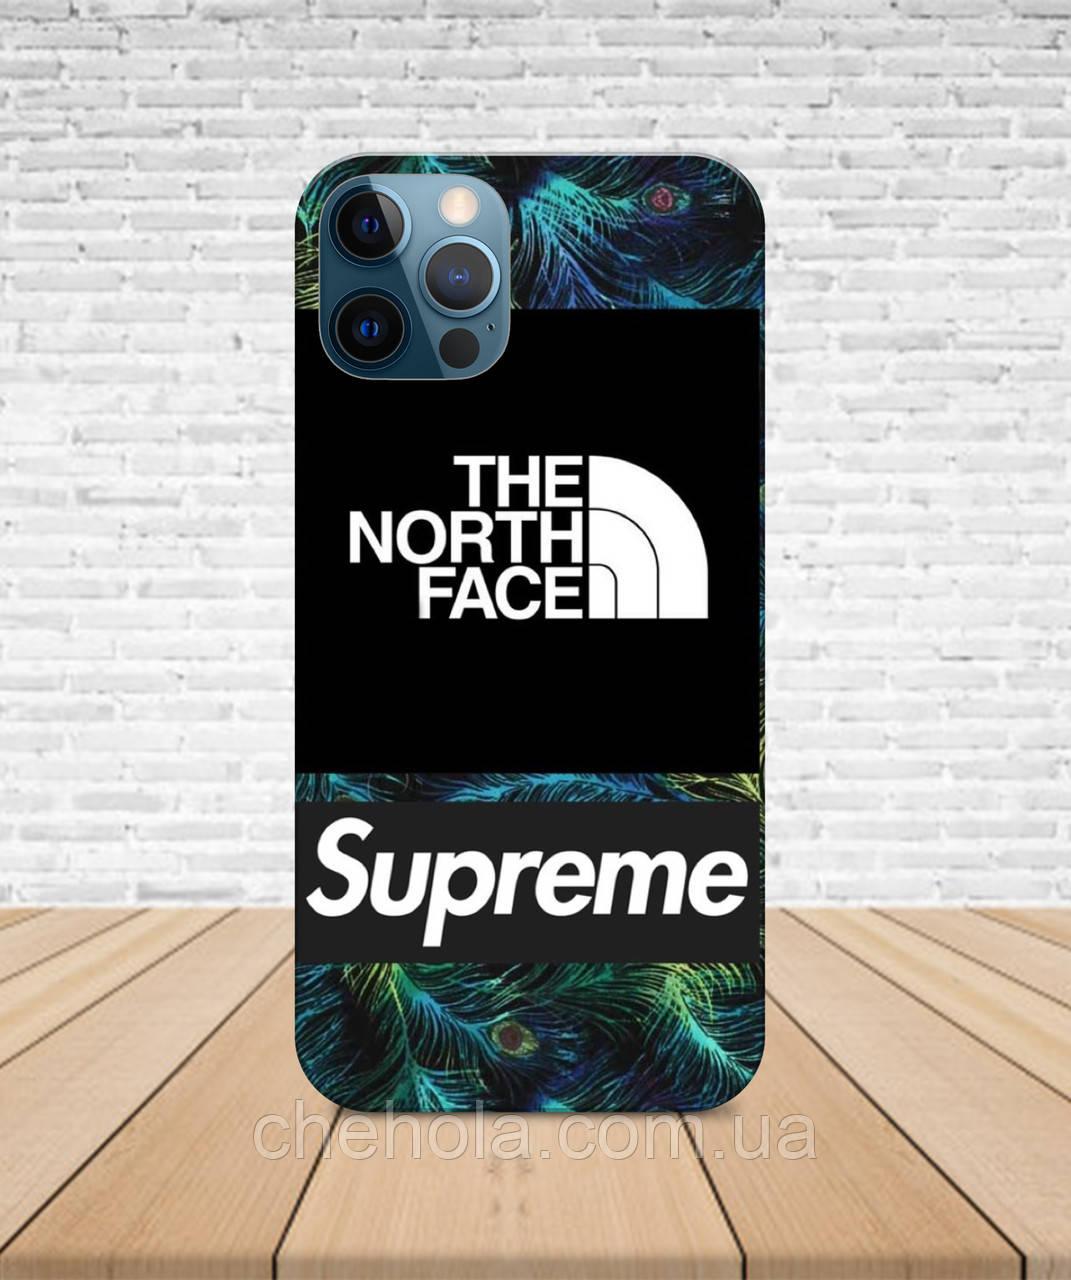 Матовый Чехол iPhone 12 Pro Max Mini В стиле Supreme TNF с принтом